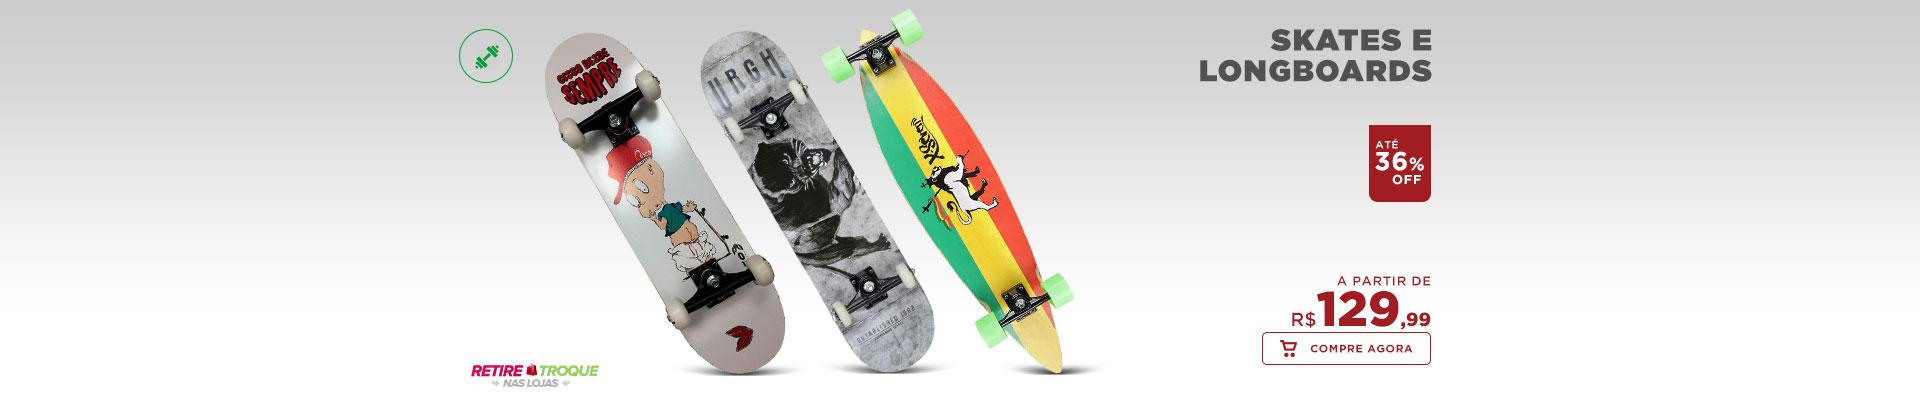 Skates e Longboards